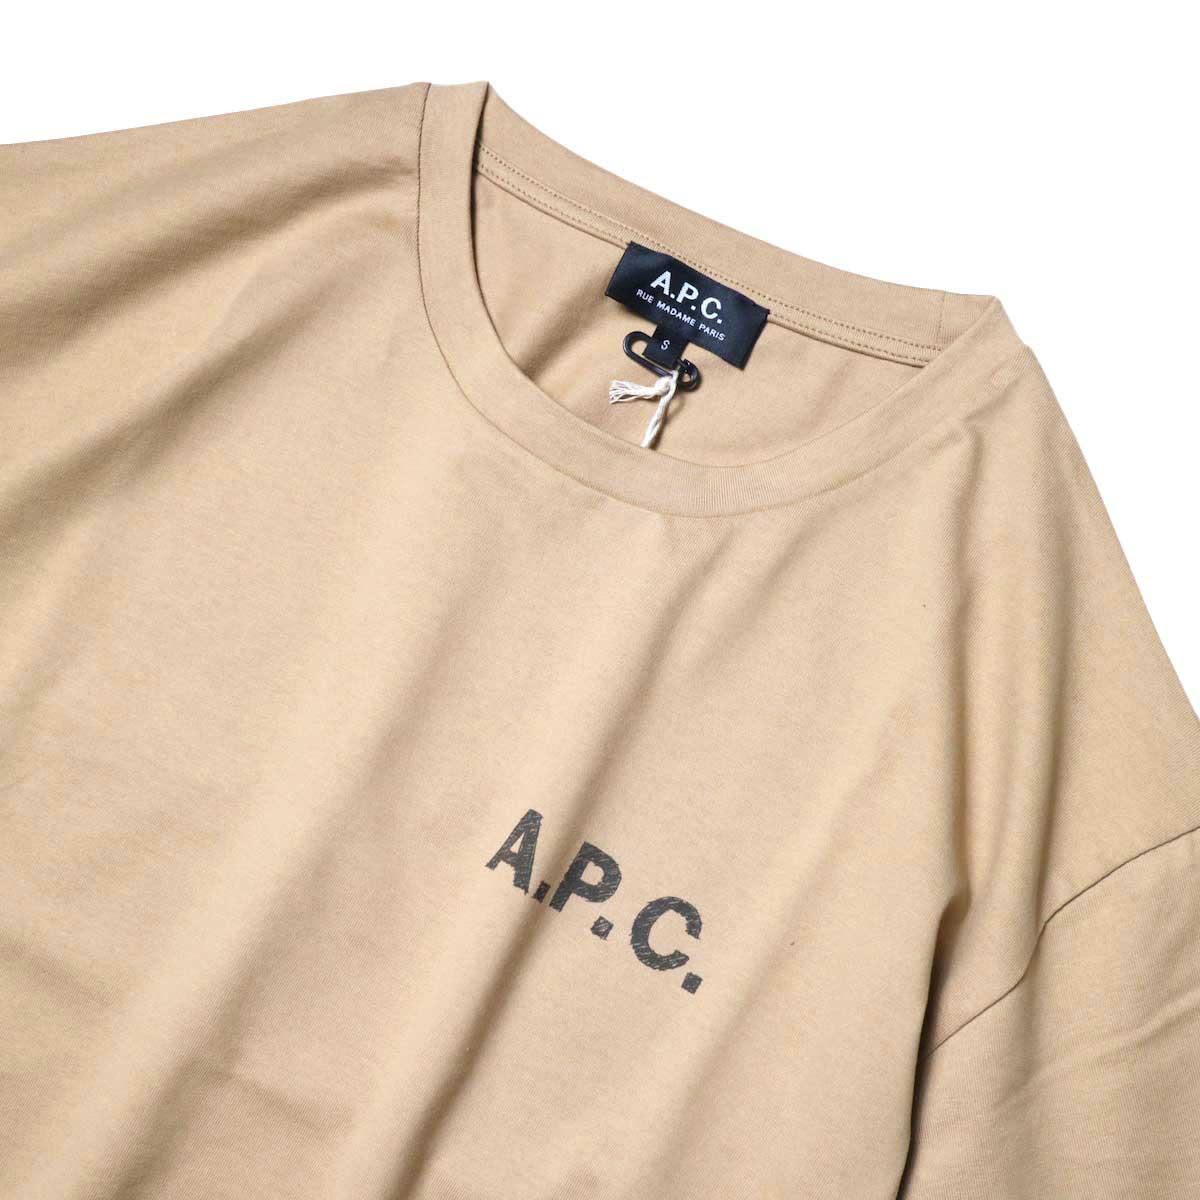 A.P.C. / Judy Tシャツ (Beige) フロント